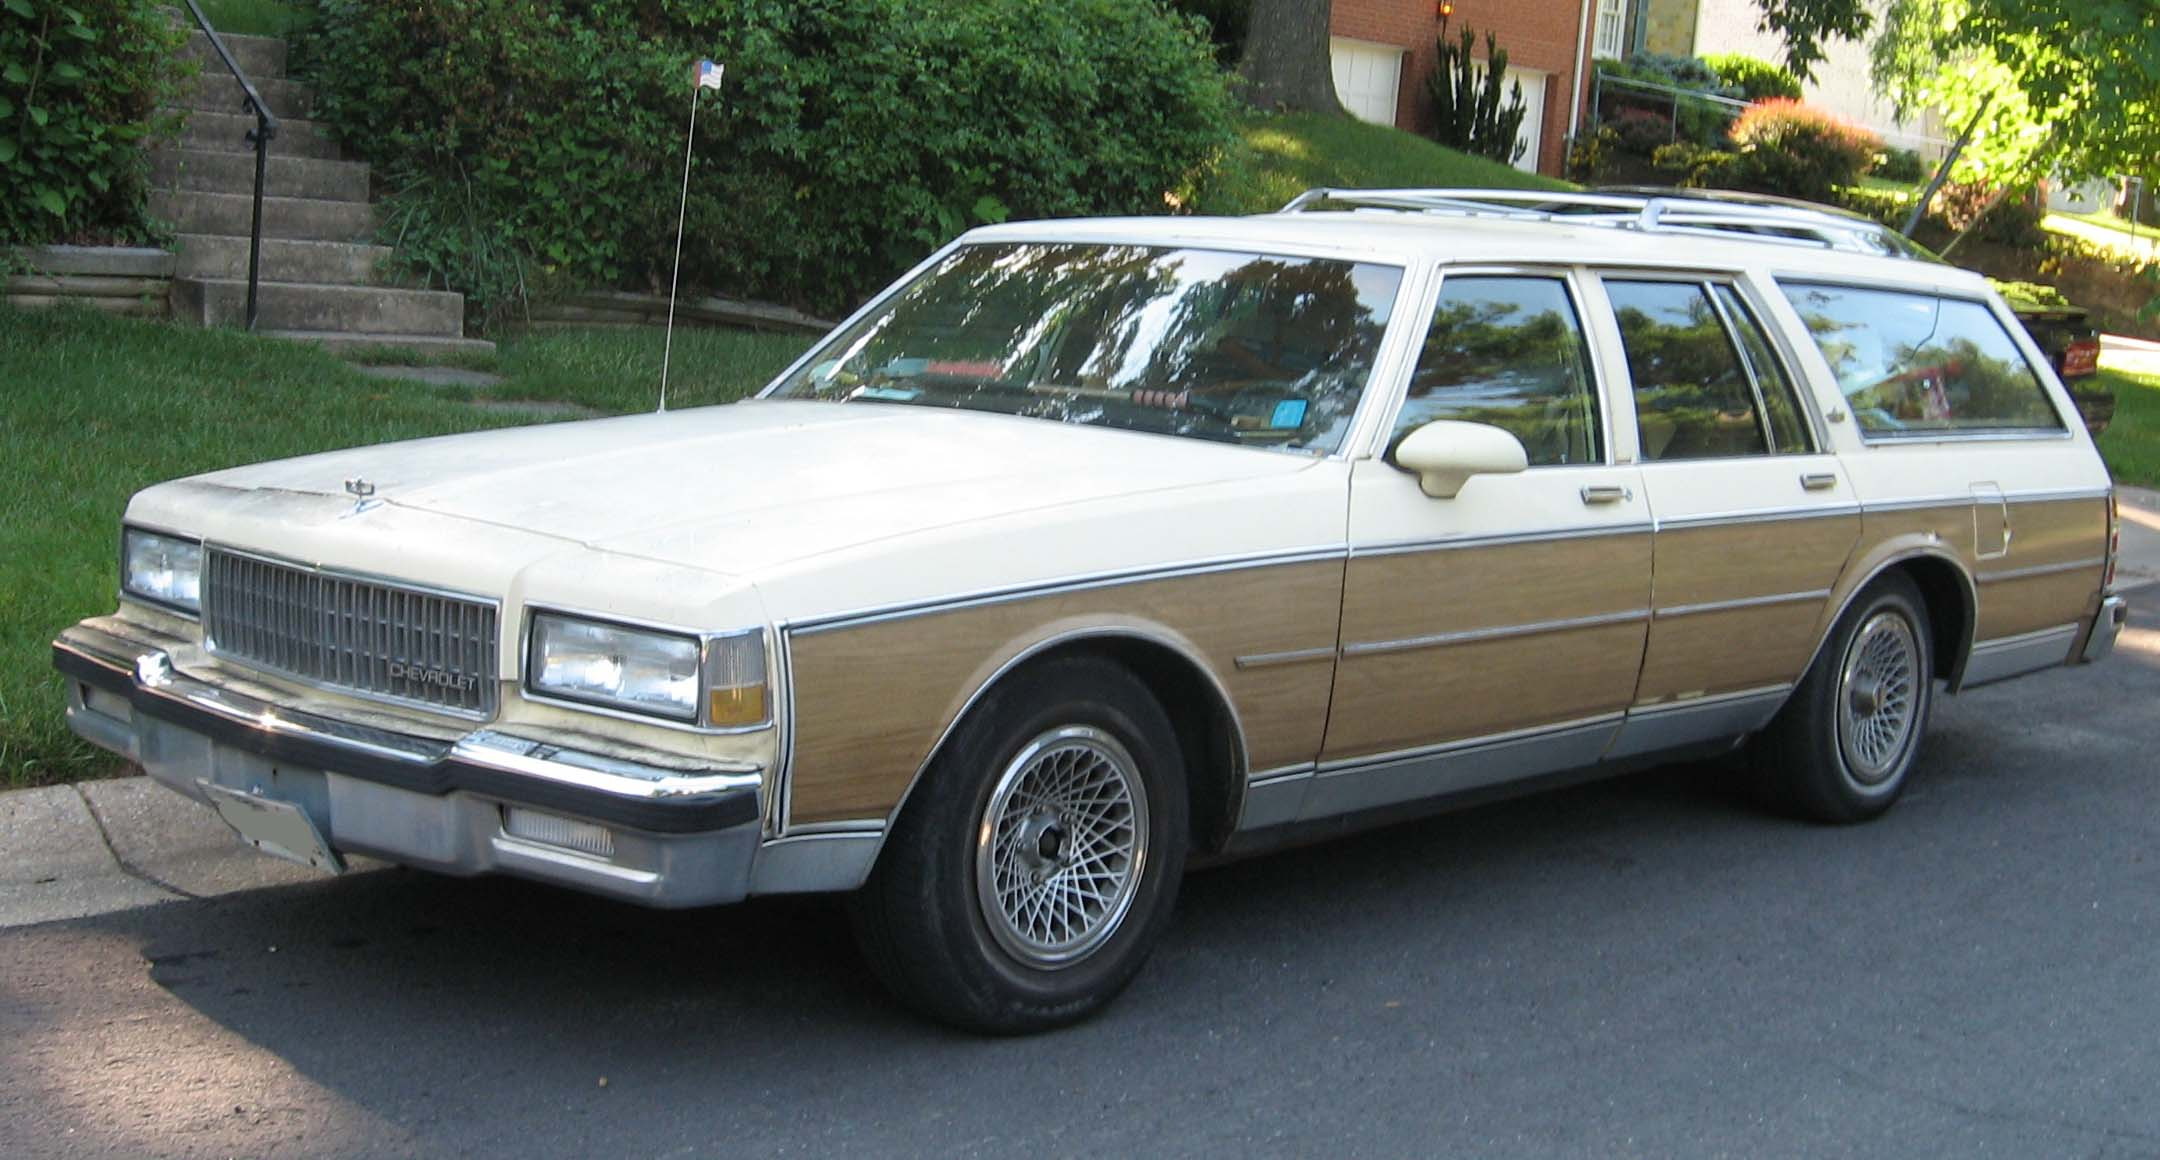 Chevrolet Caprice 1985 foto - 5